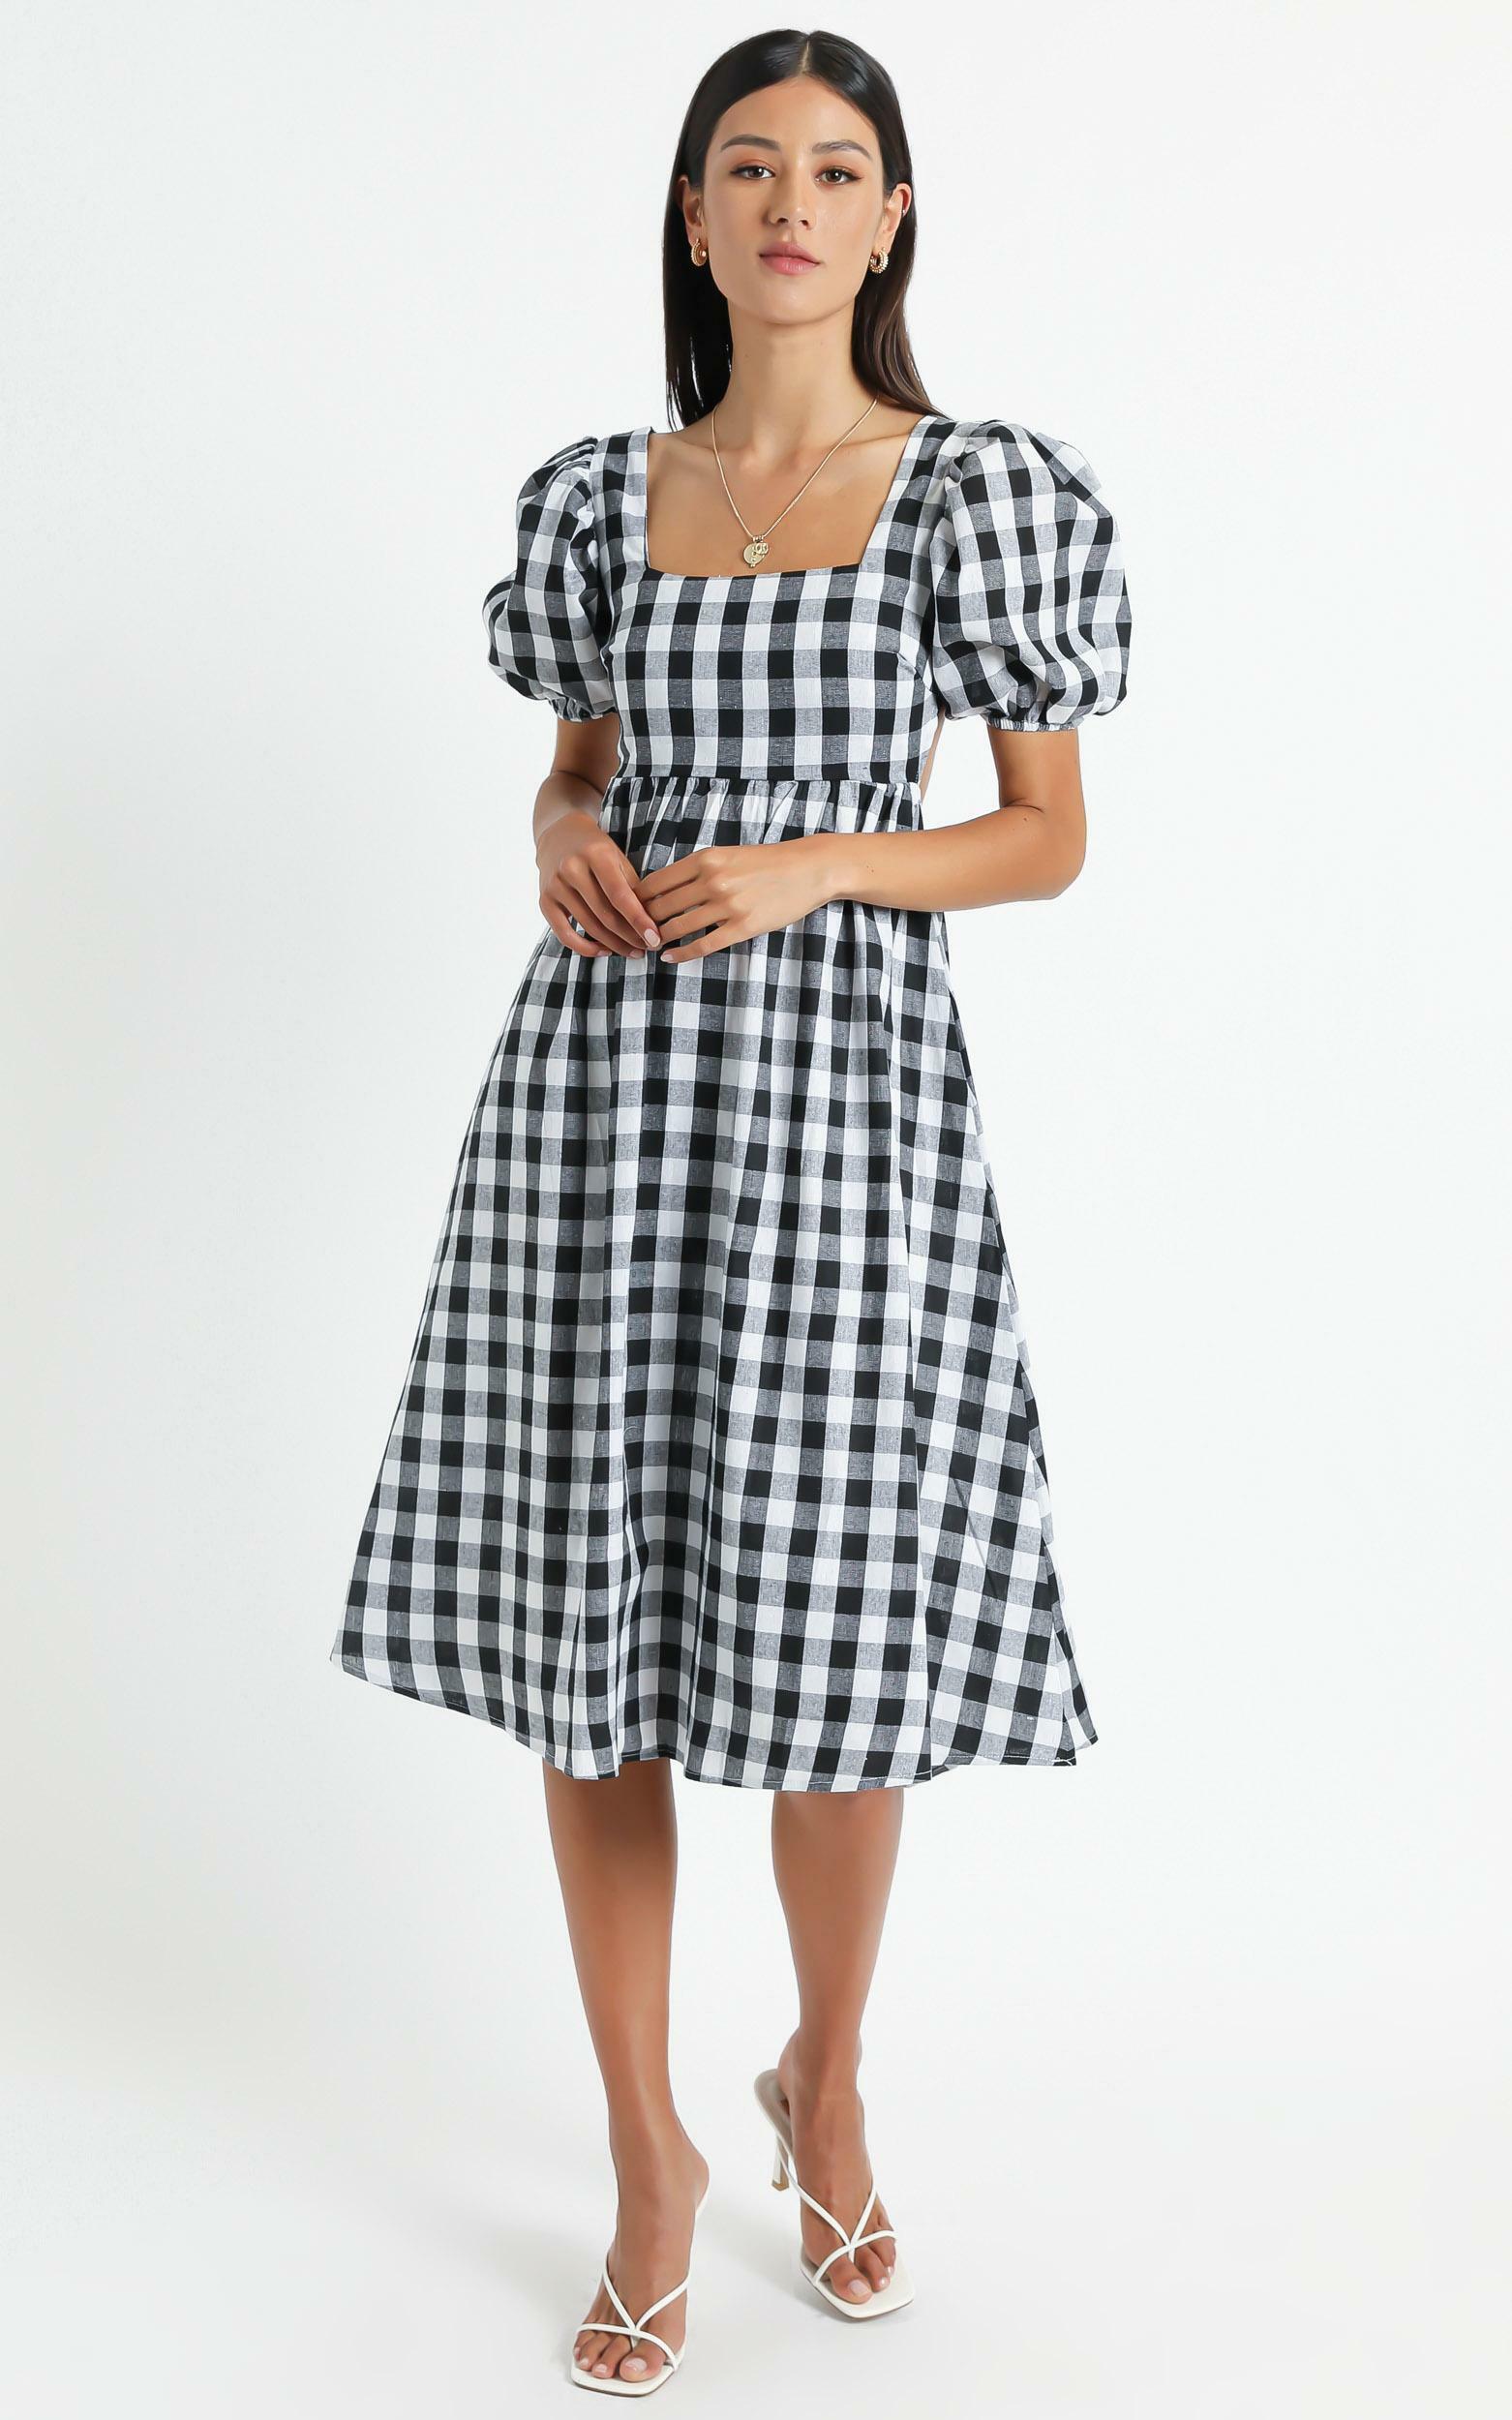 Bennie Dress in Black Gingham - 6 (XS), Black, hi-res image number null